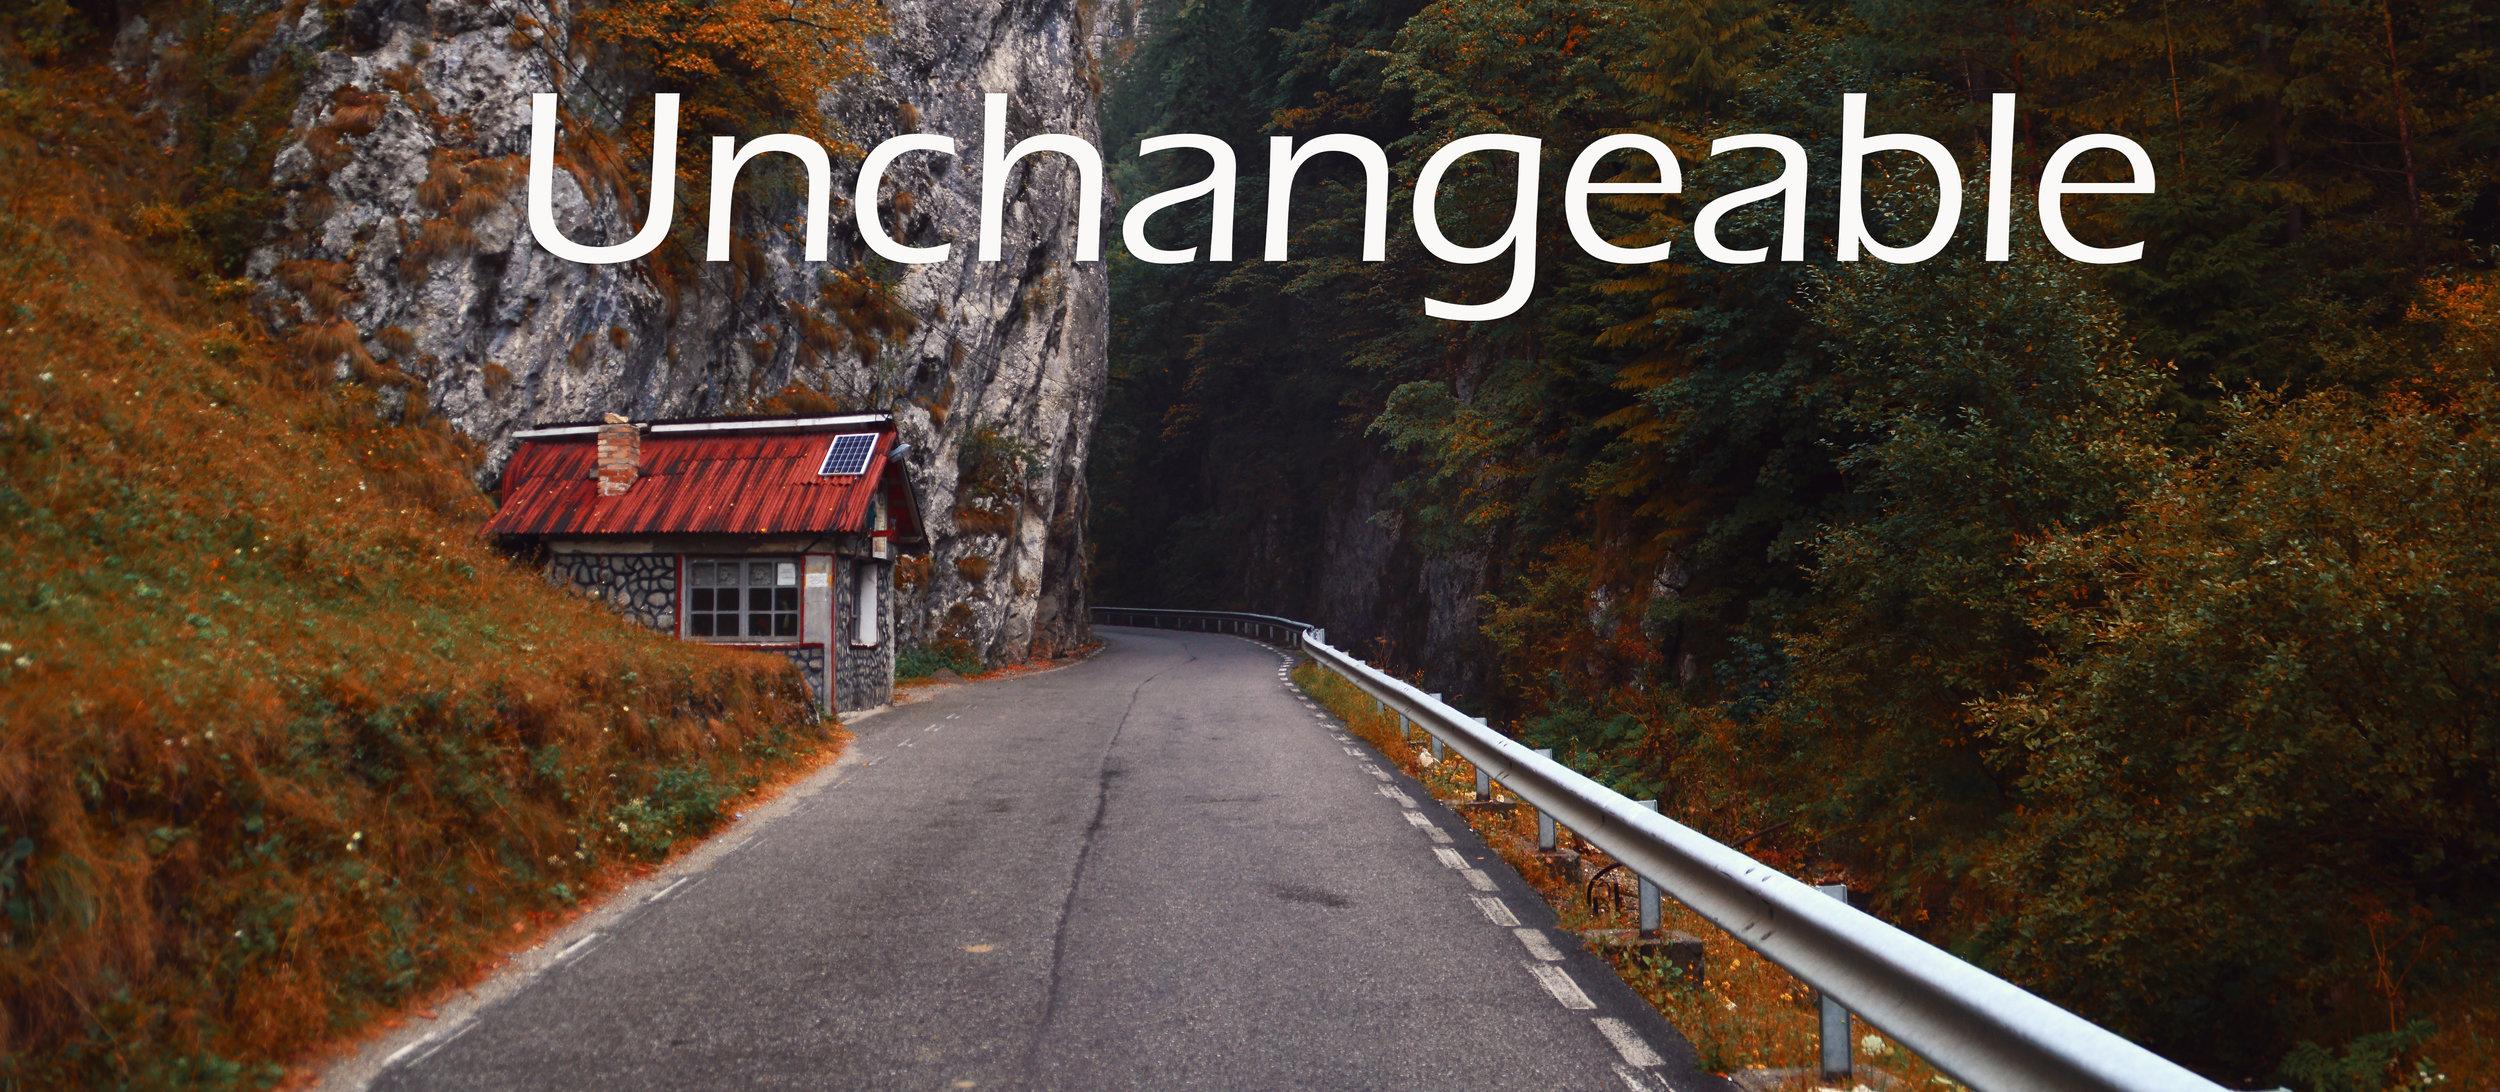 Unchangeable.jpg